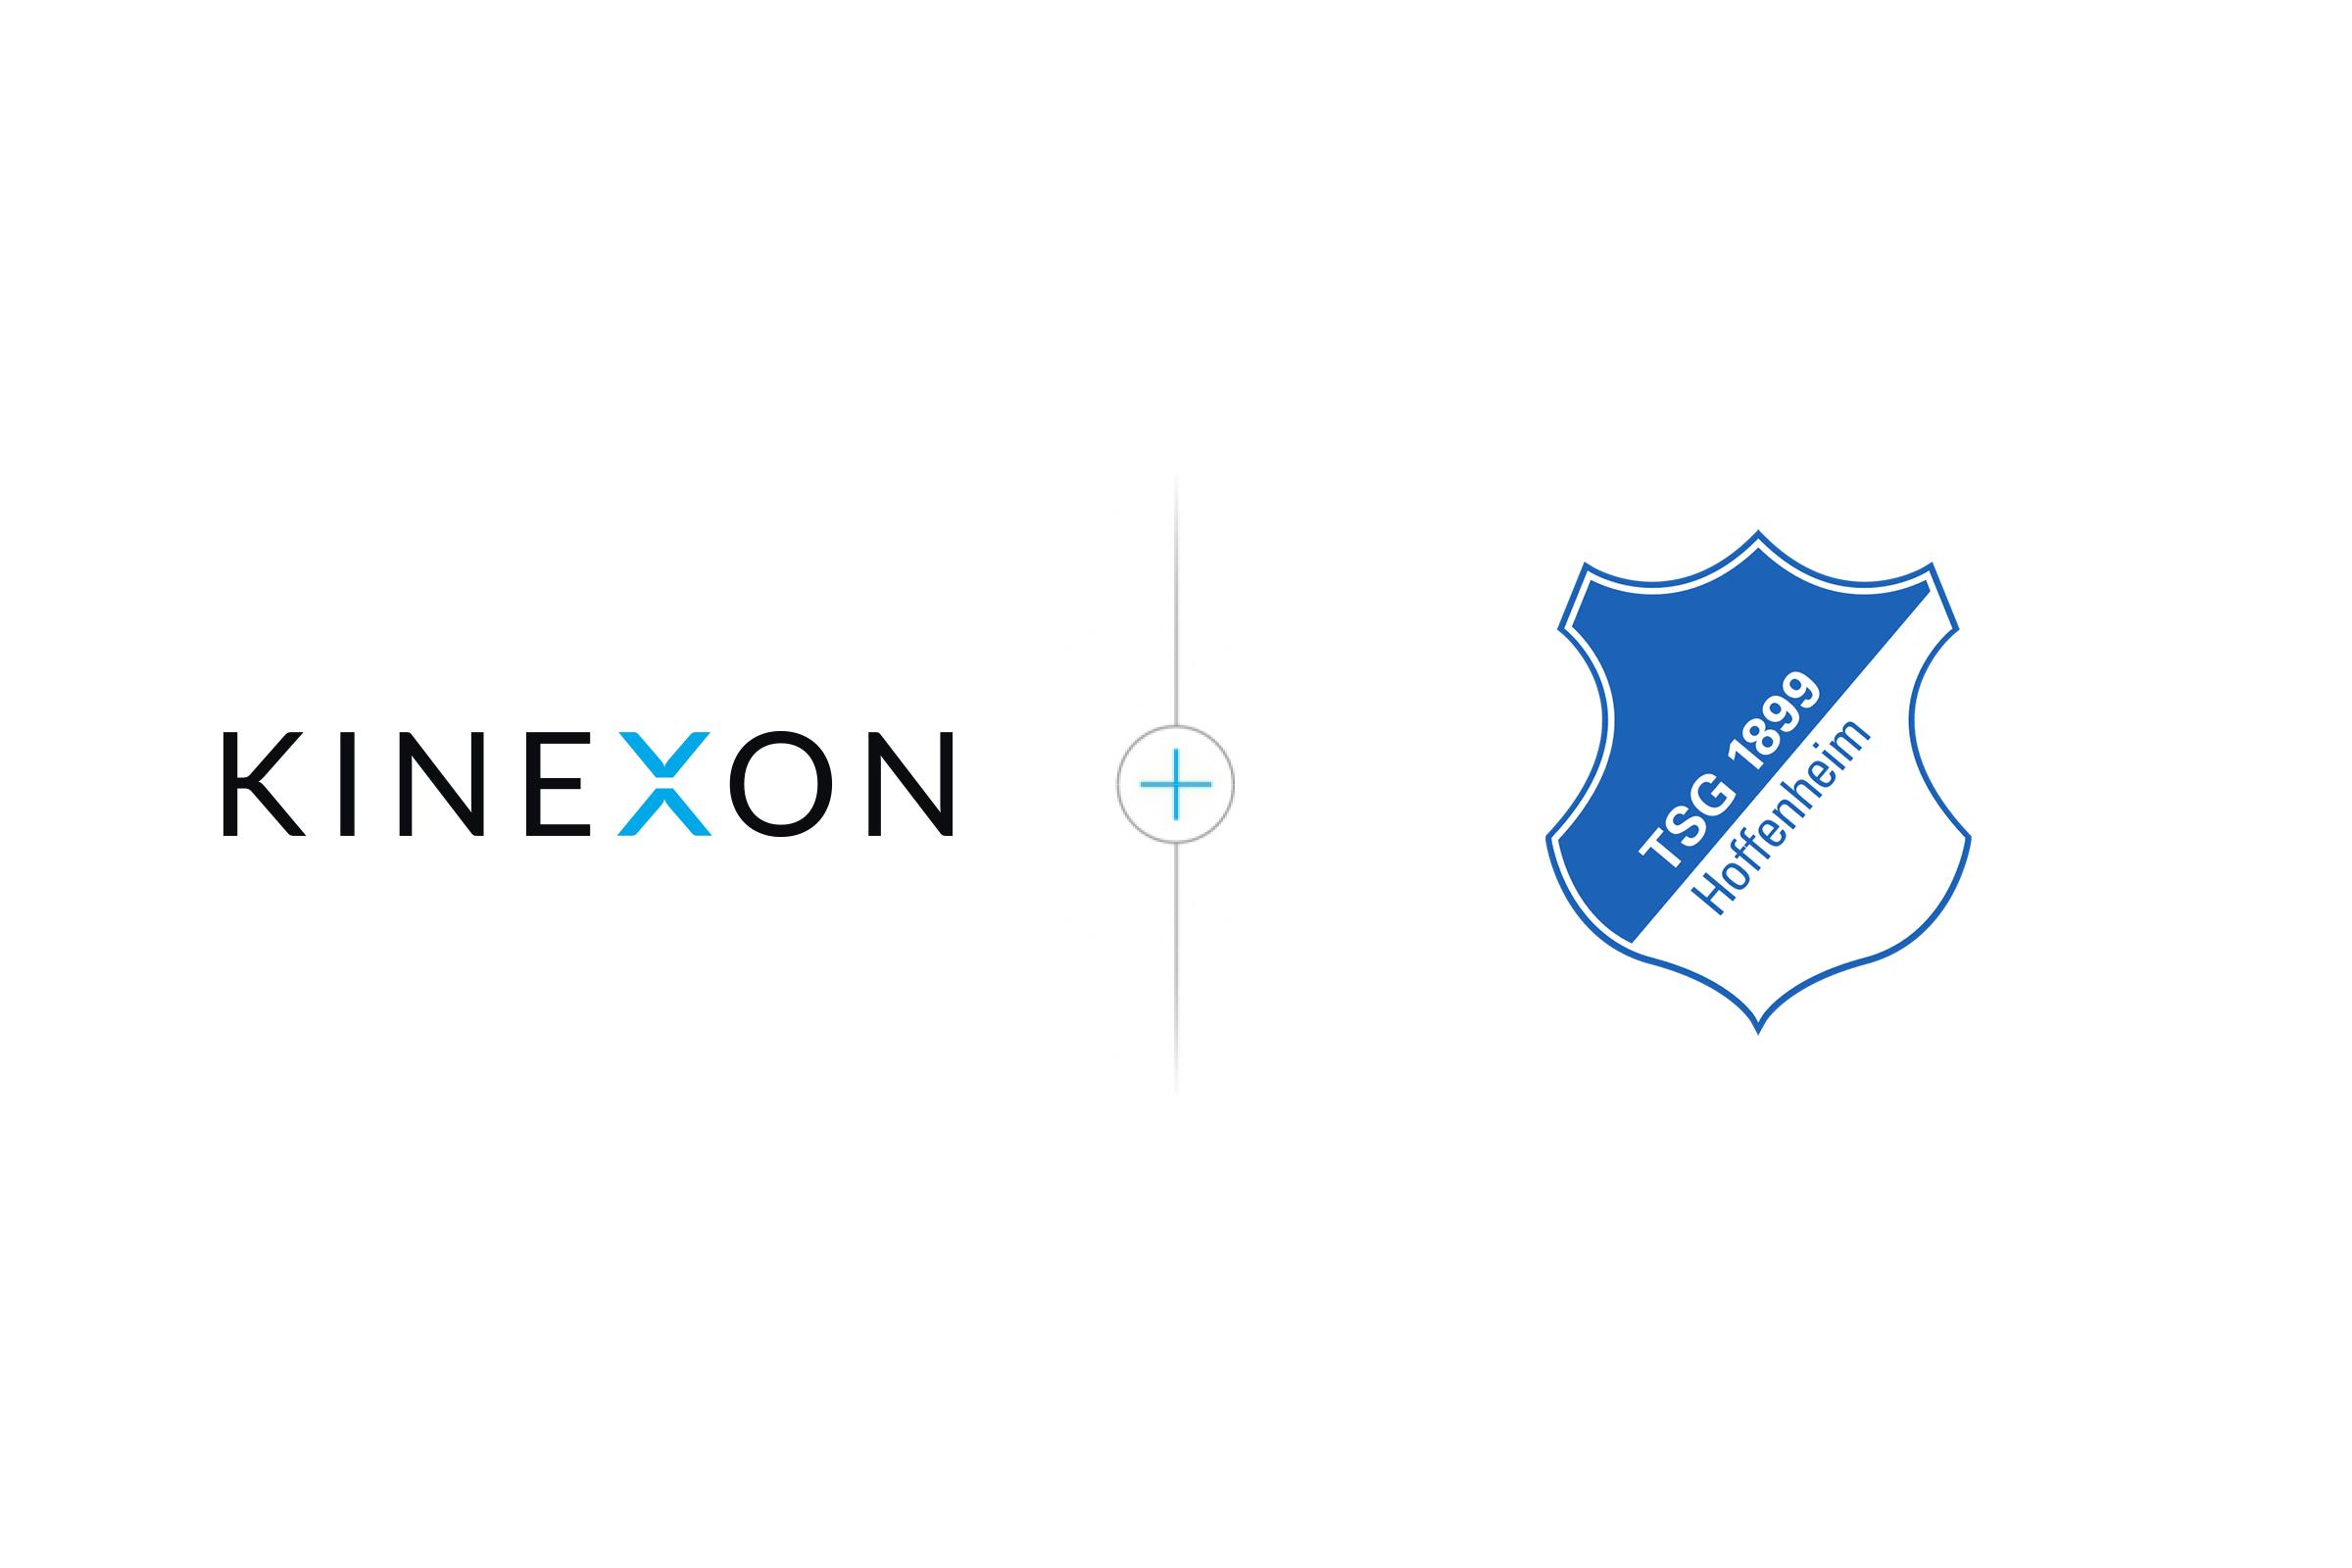 KINEXON X TSG Hoffenheim